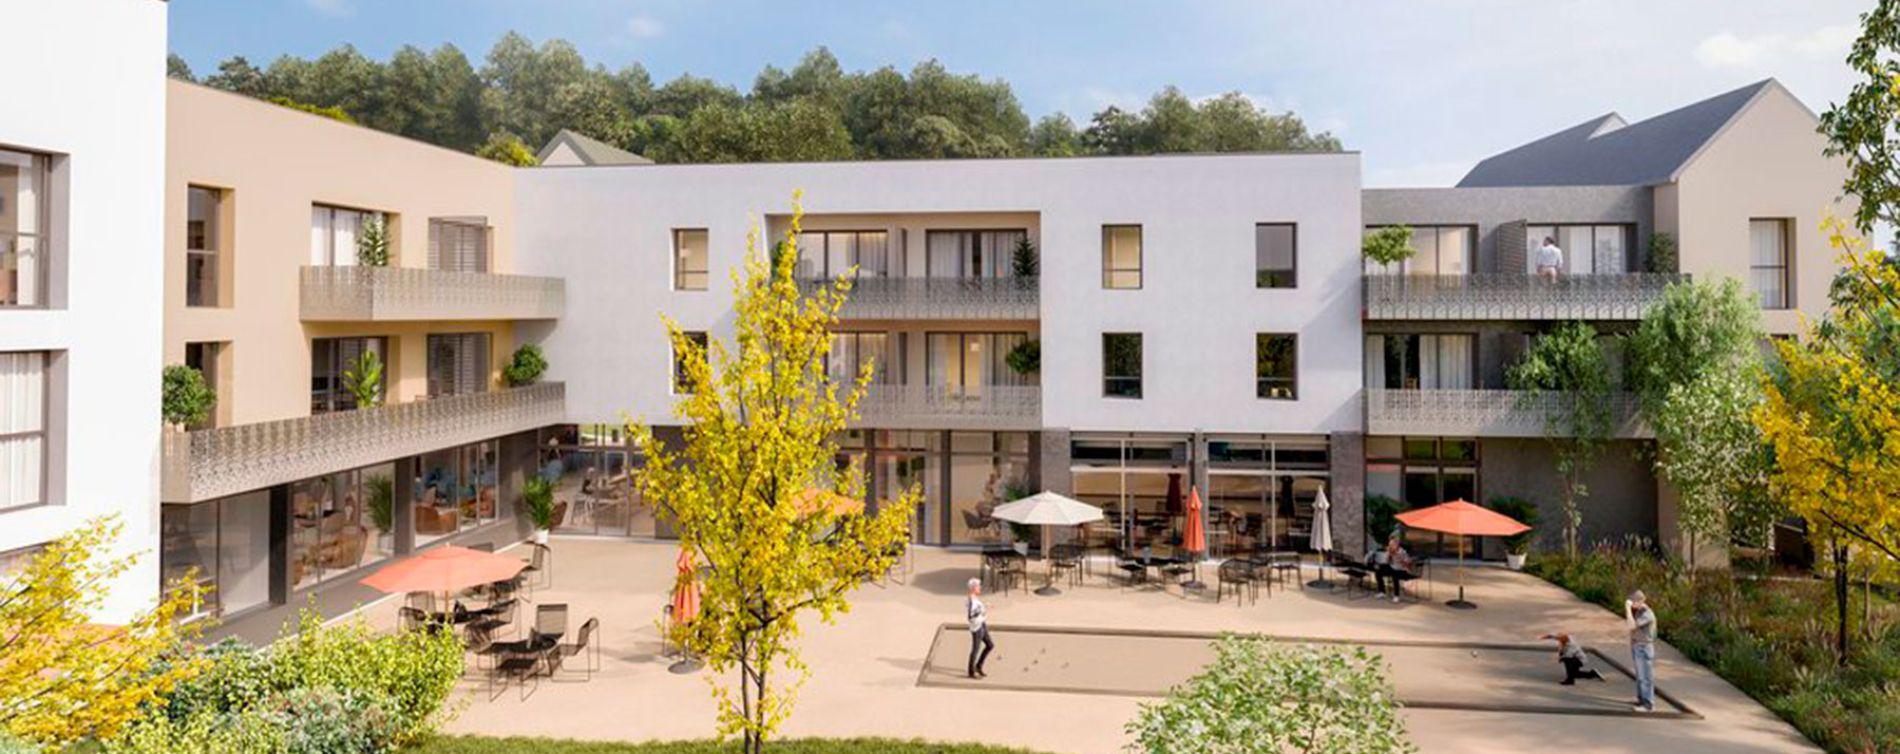 Dinan : programme immobilier neuve « Les Jardins d'Ahna » (2)